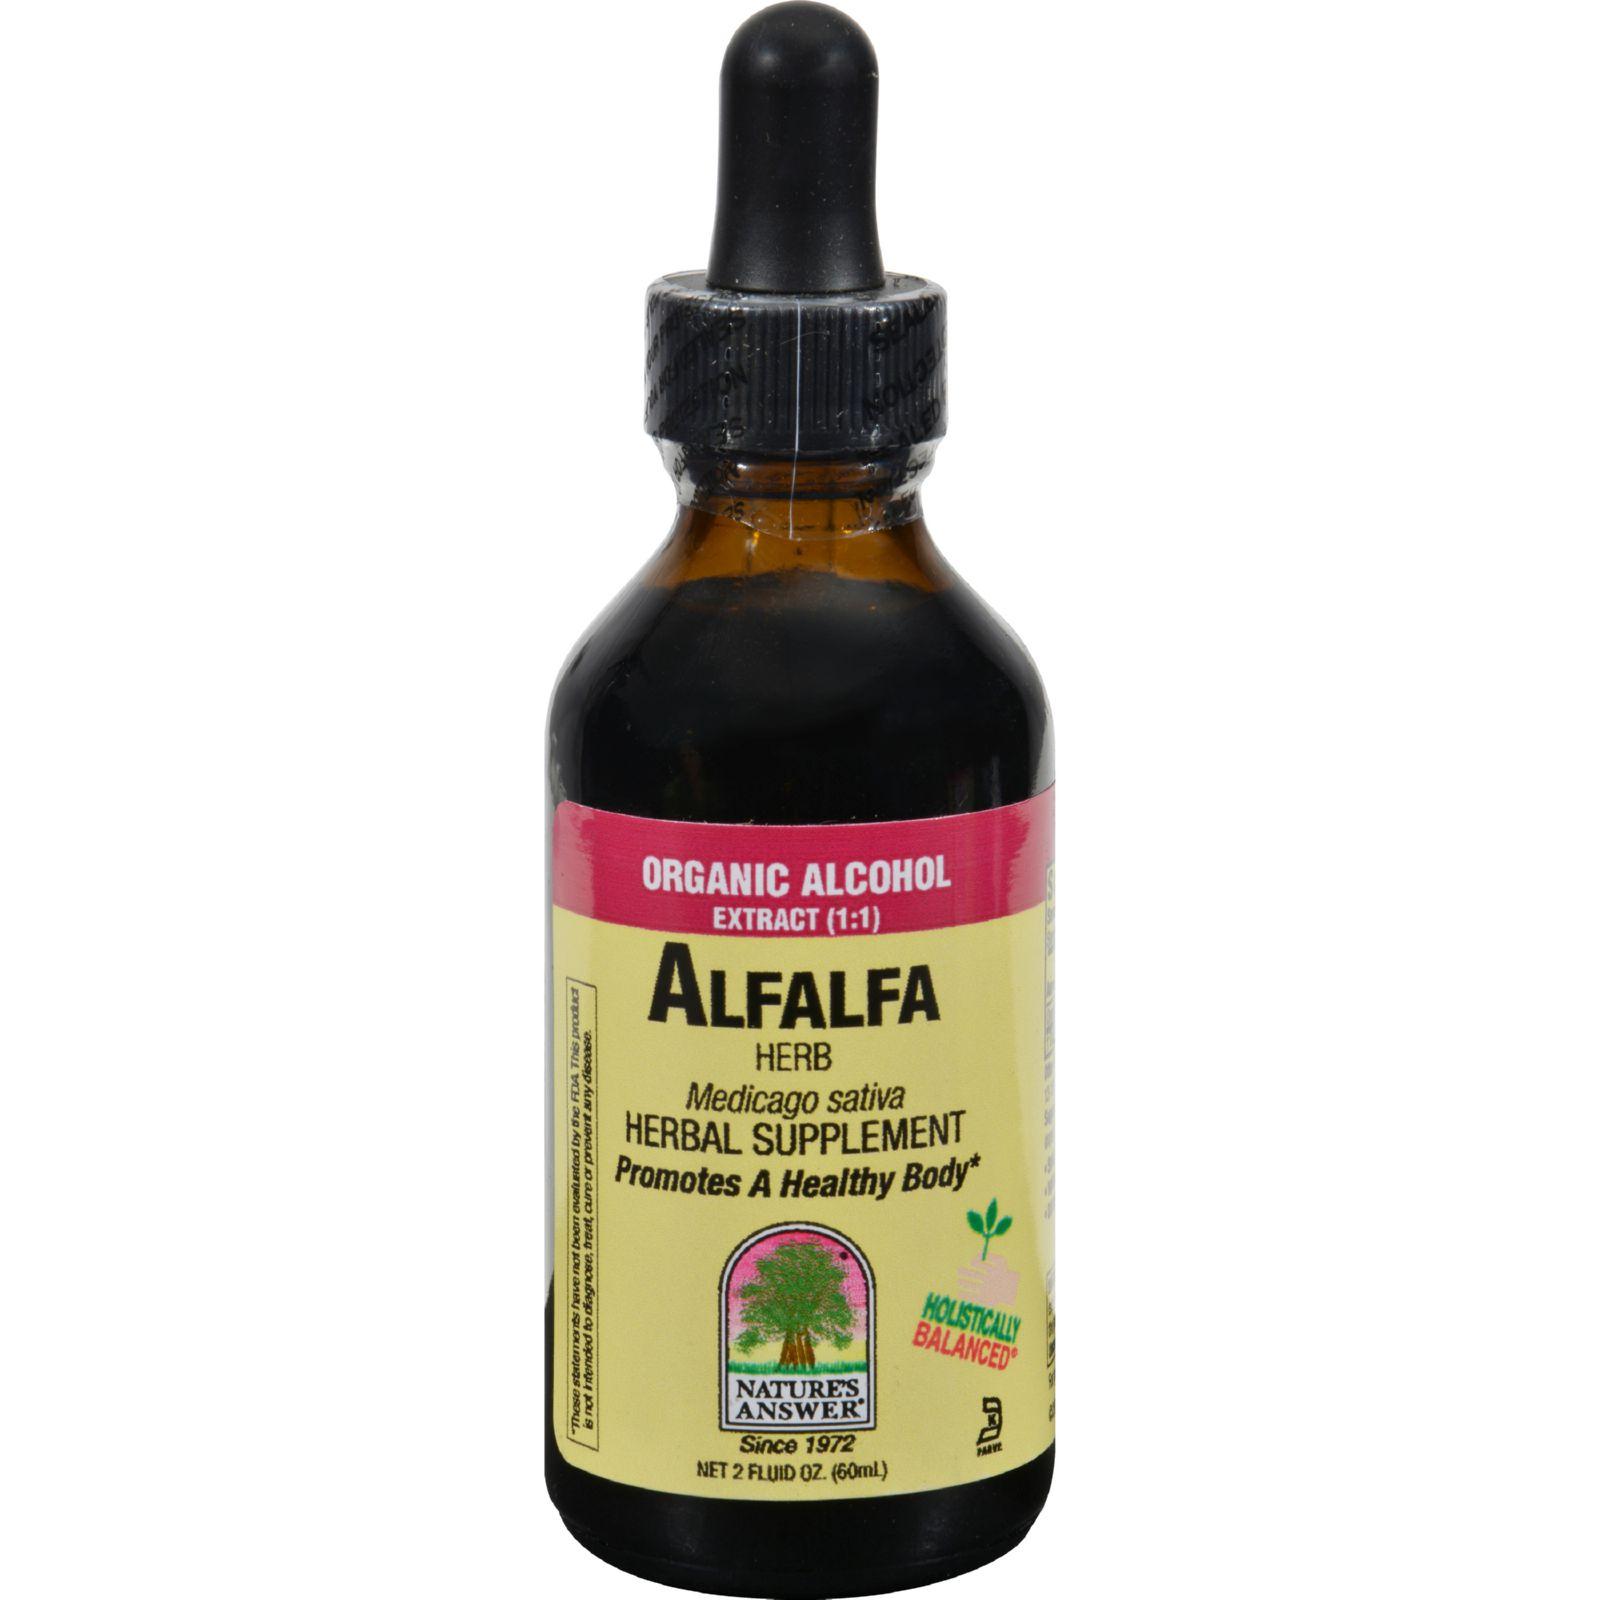 Nature's Answer Alfalfa Herb - 2 Fl Oz